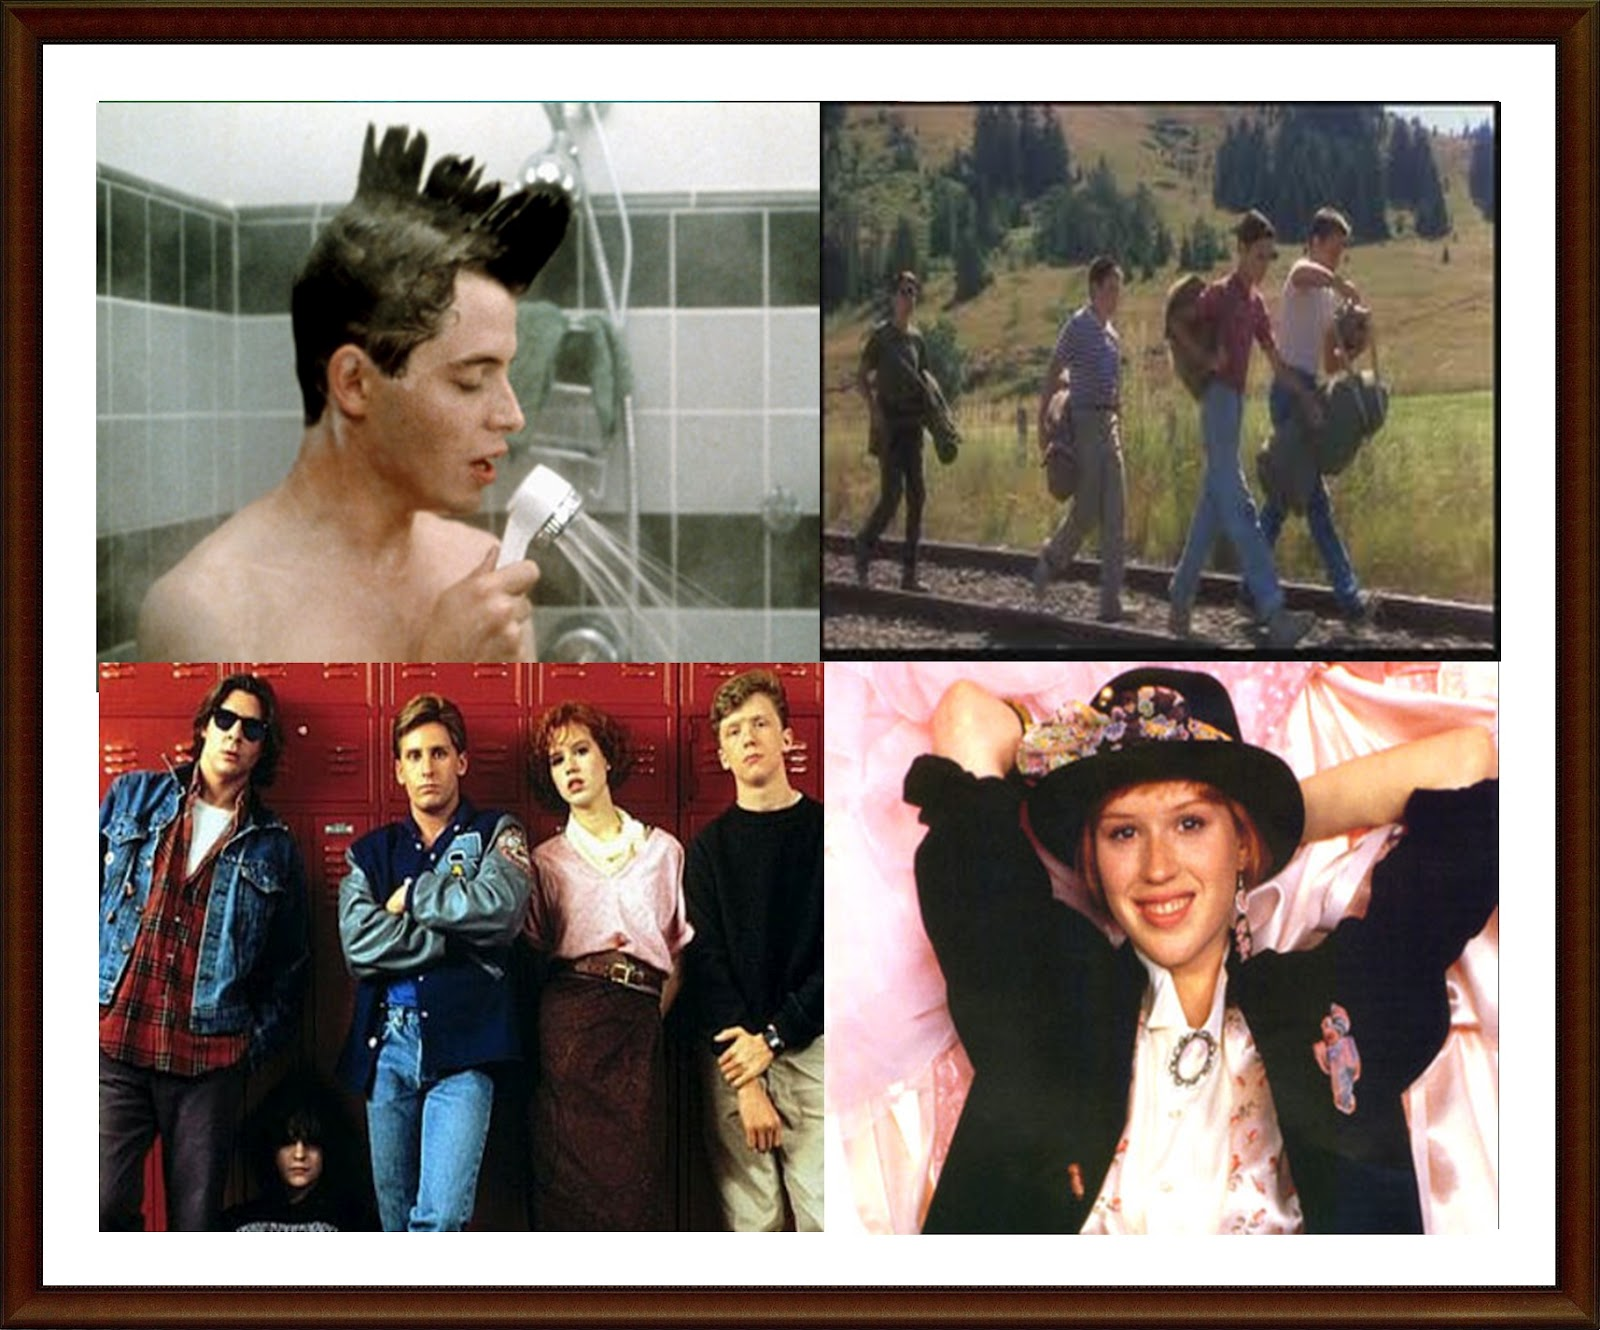 Cinema 4x4 4x4 Filmes Teens Anos 80